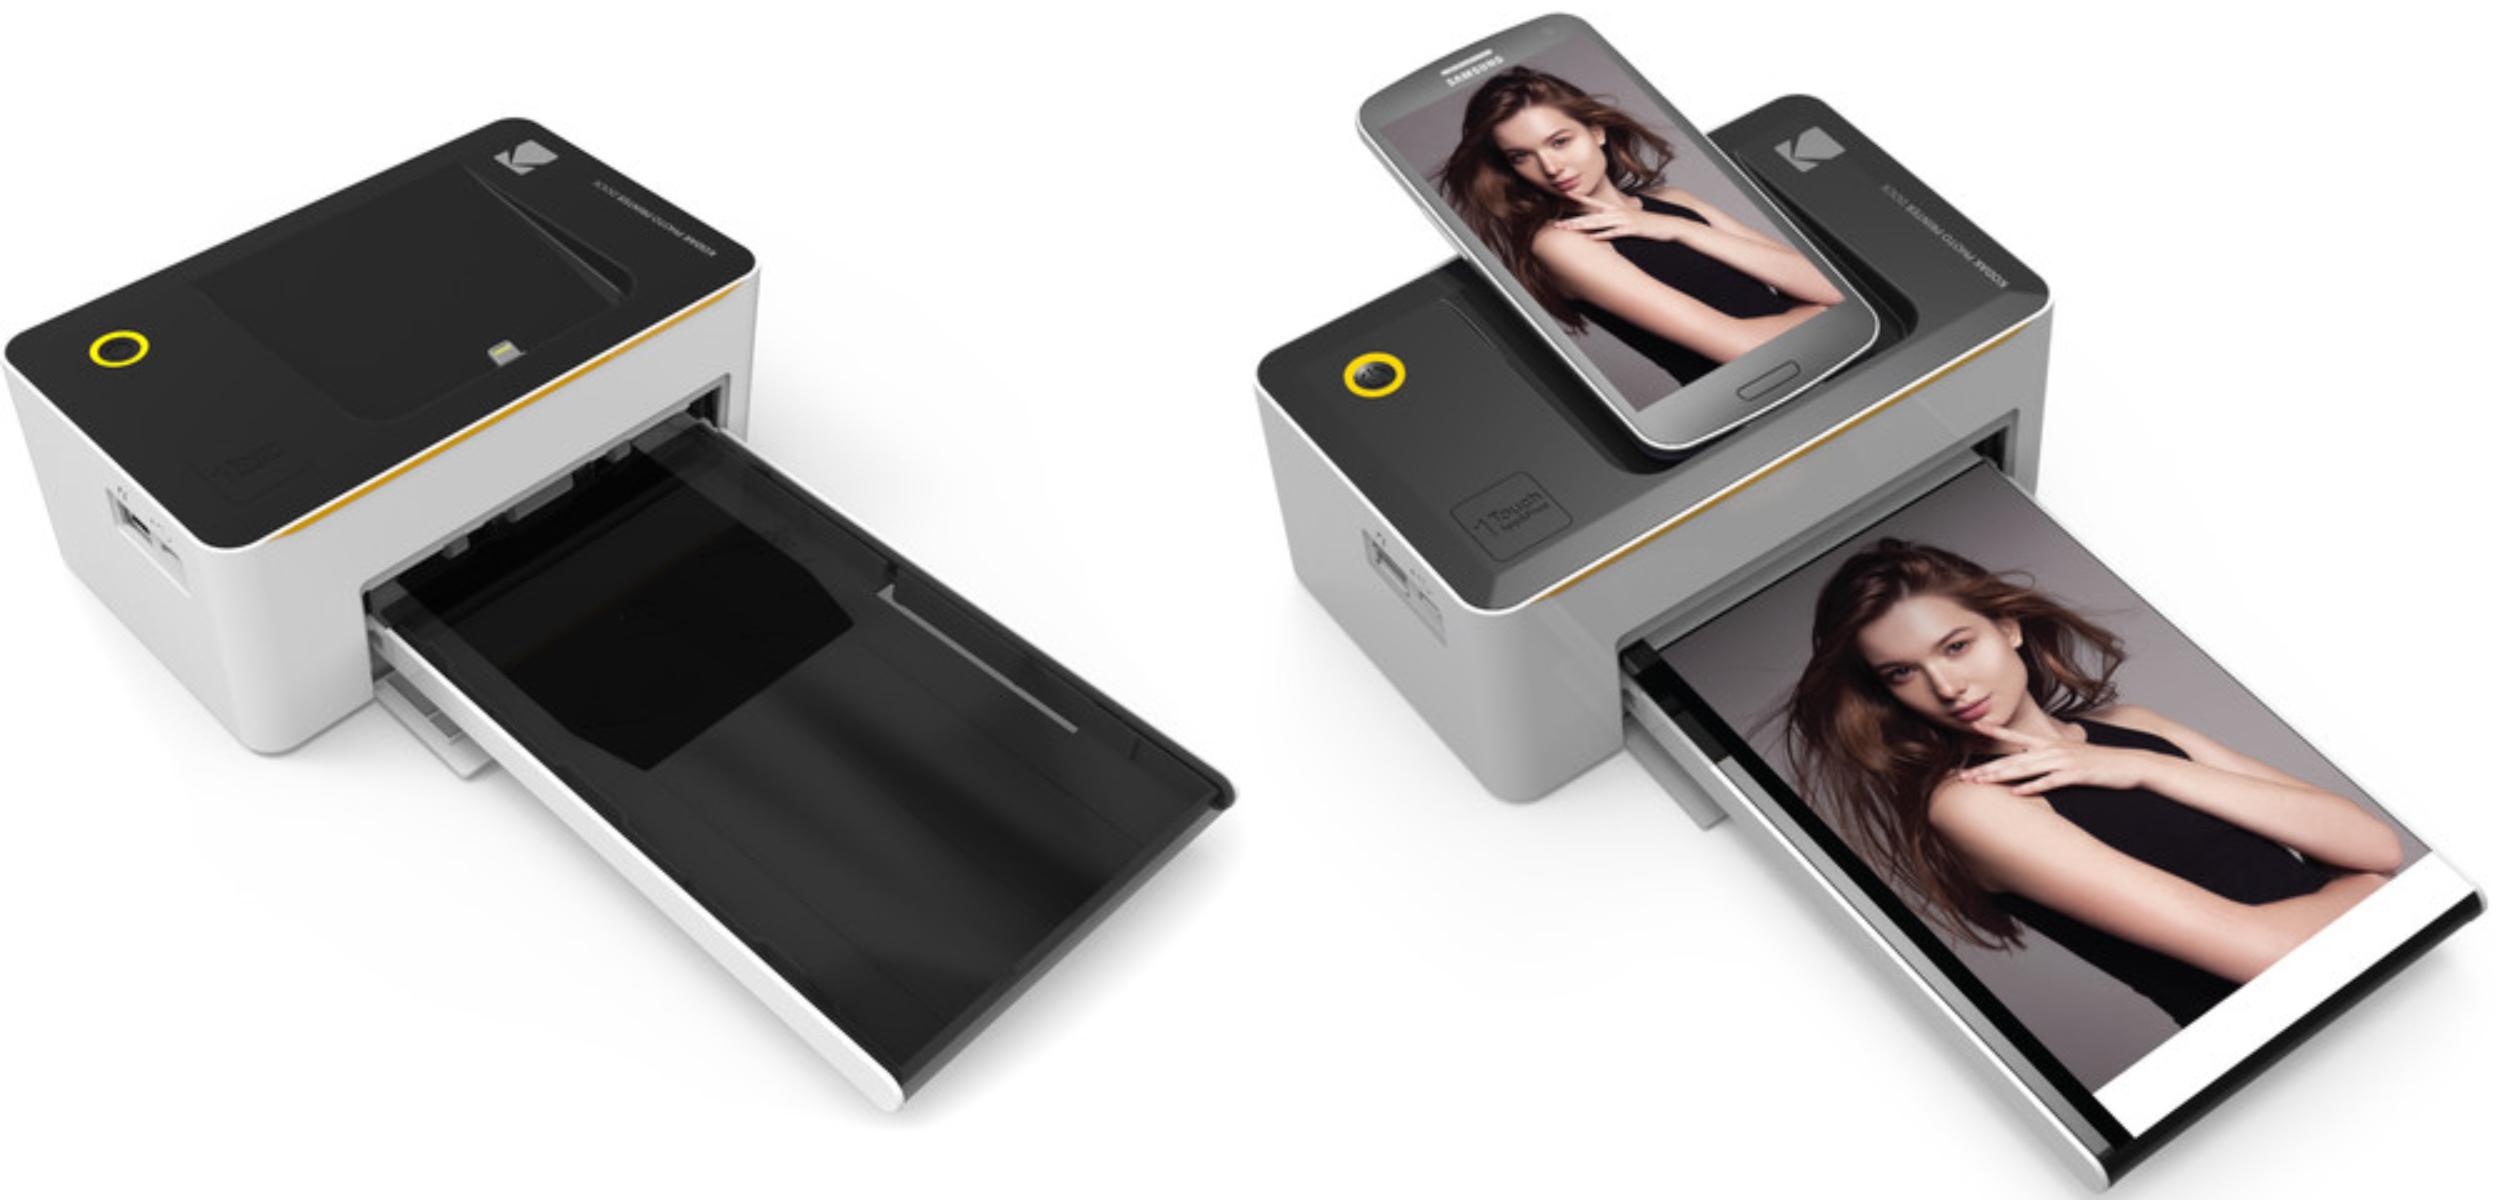 Kodak Photo Printer with Wifi